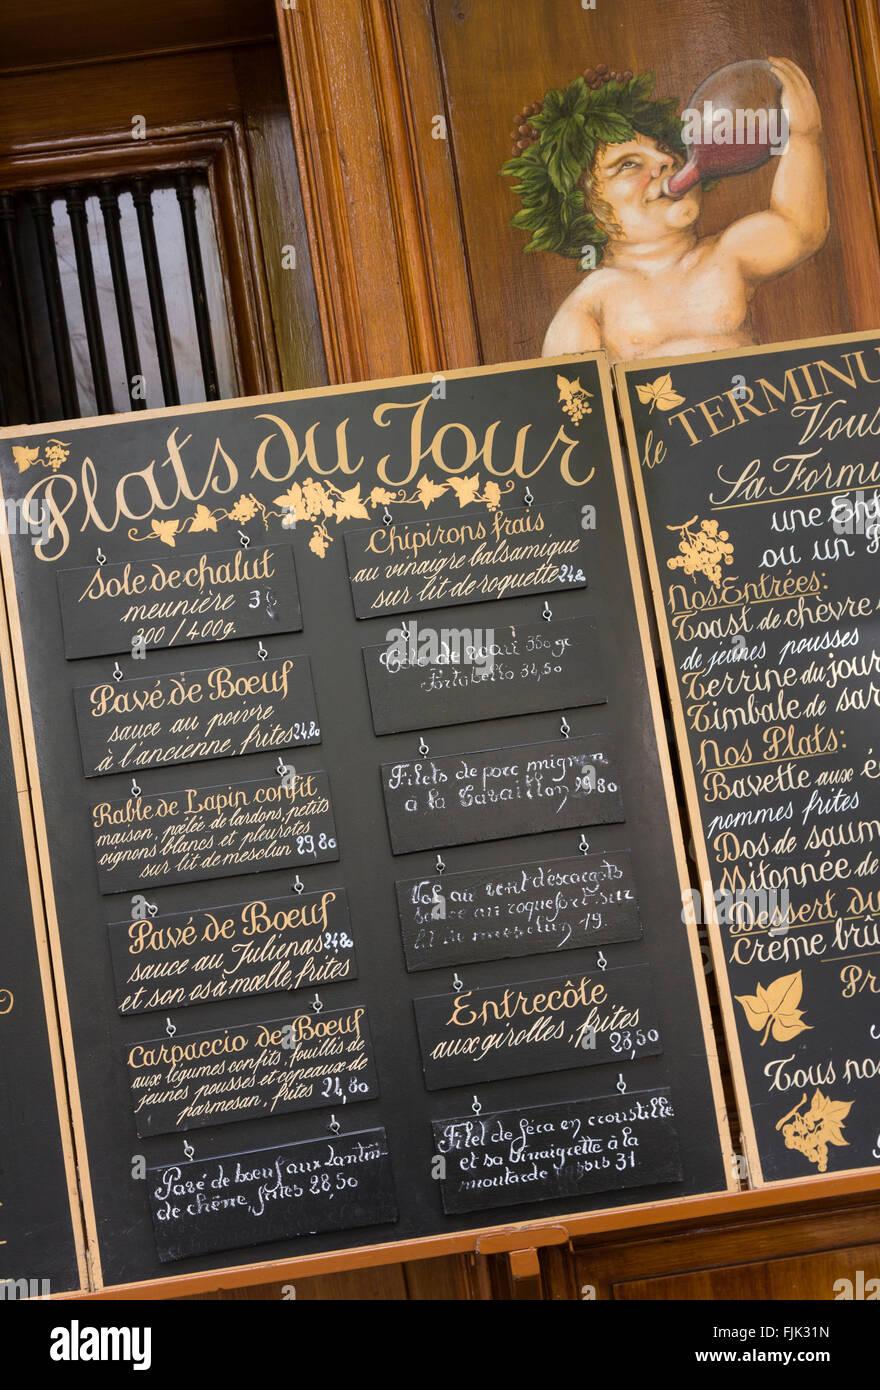 french brasserie chairs positive posture massage chair restaurant menu, paris france. dining establishment lists its stock photo: 97535137 - alamy